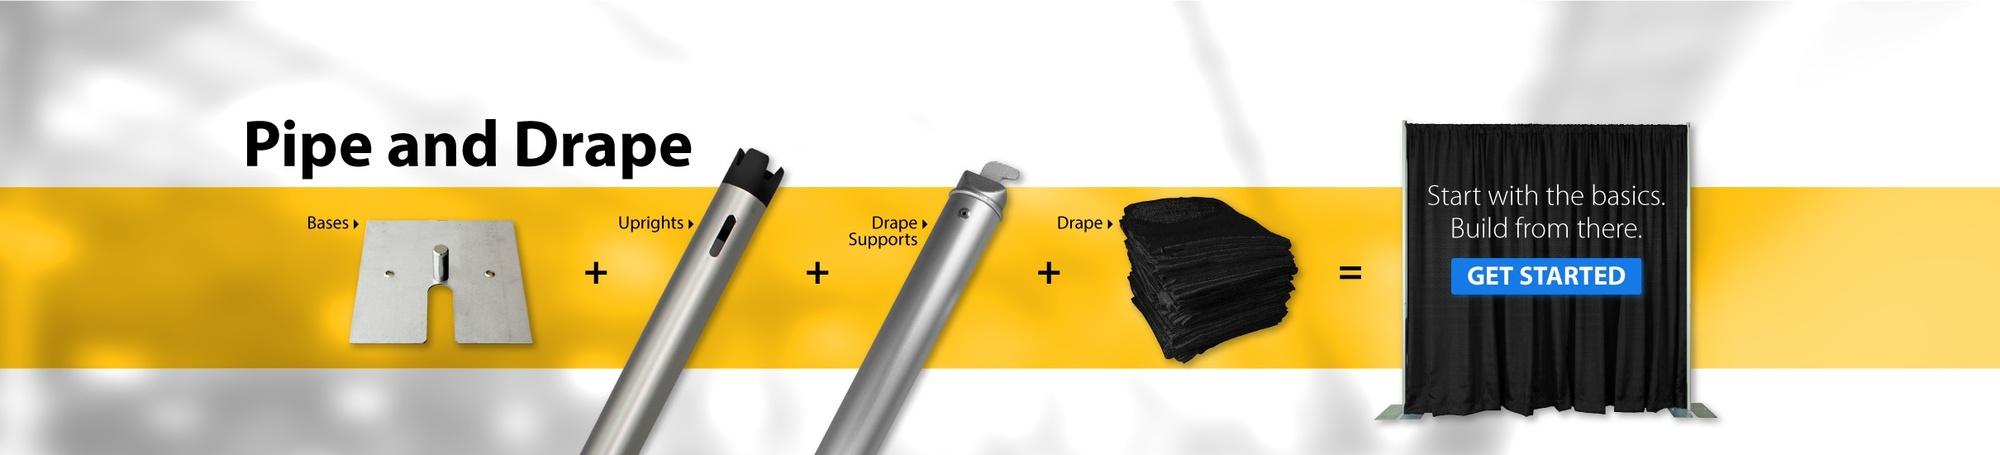 pipe and drape basics